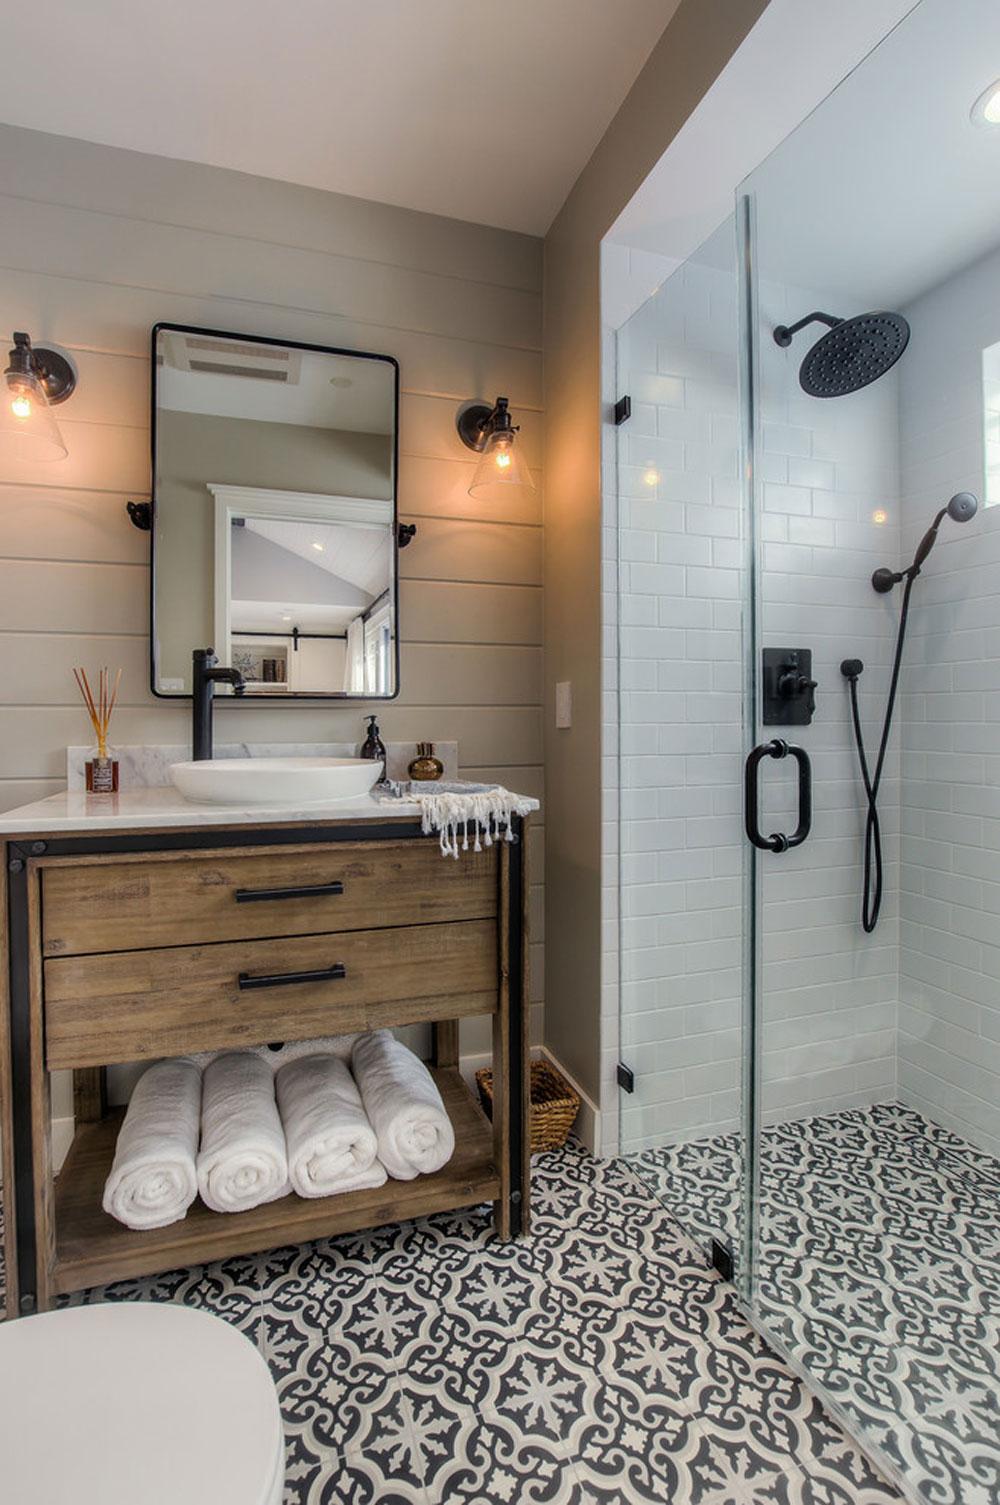 Santa-Monica-Garage-Remodeling-by-Spazio-LA Farmhouse Bathroom: Decor, Ideas, Lighting, and Style